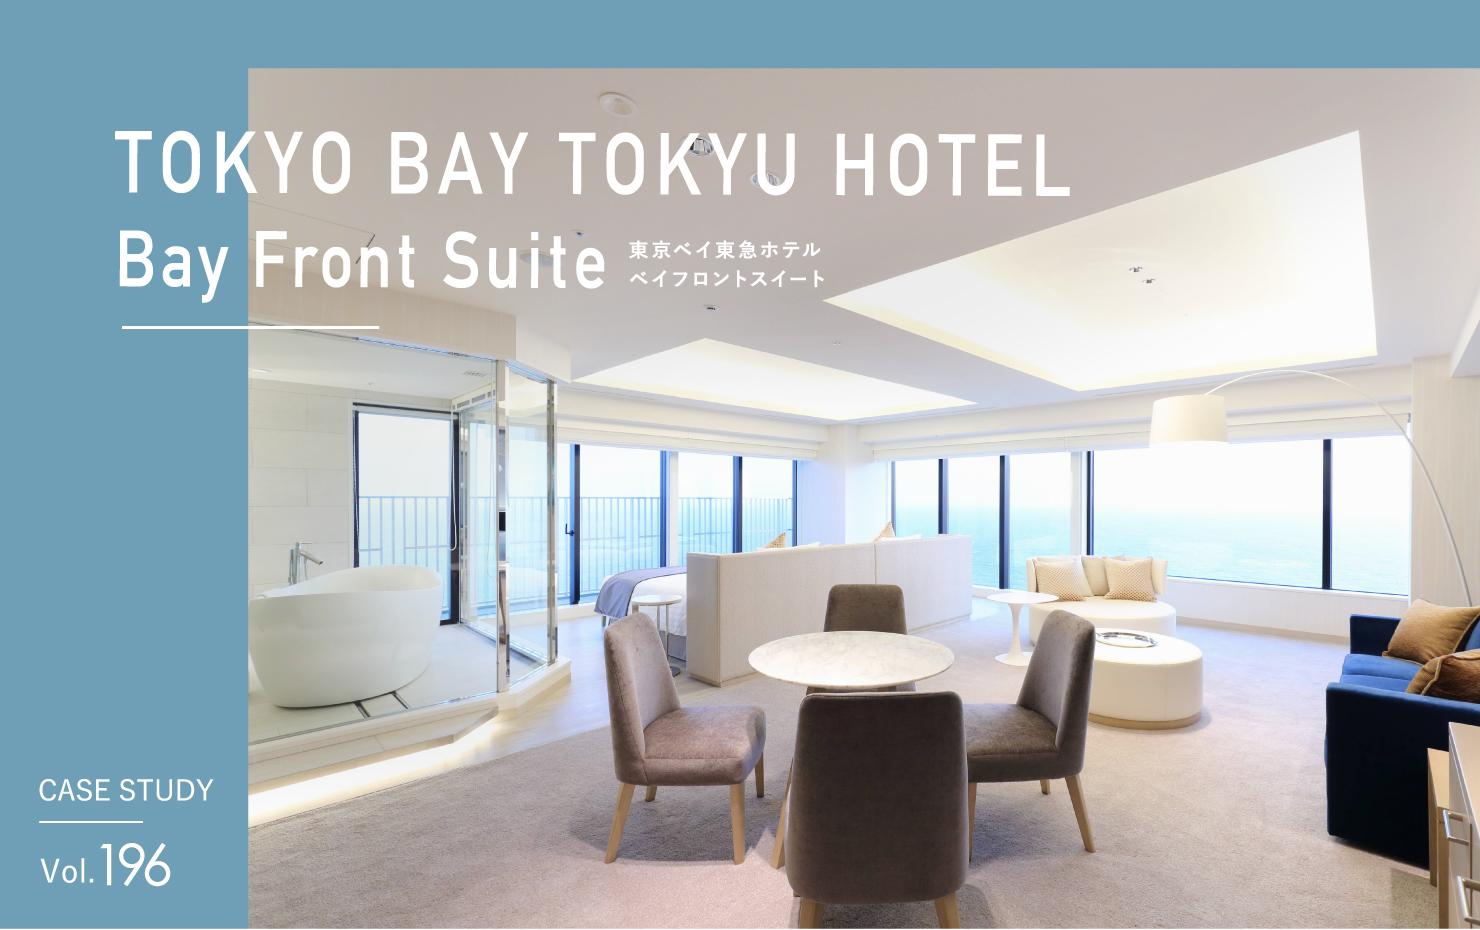 CASE STUDY Vol.196 東京ベイ東急ホテル 米フロントスイート